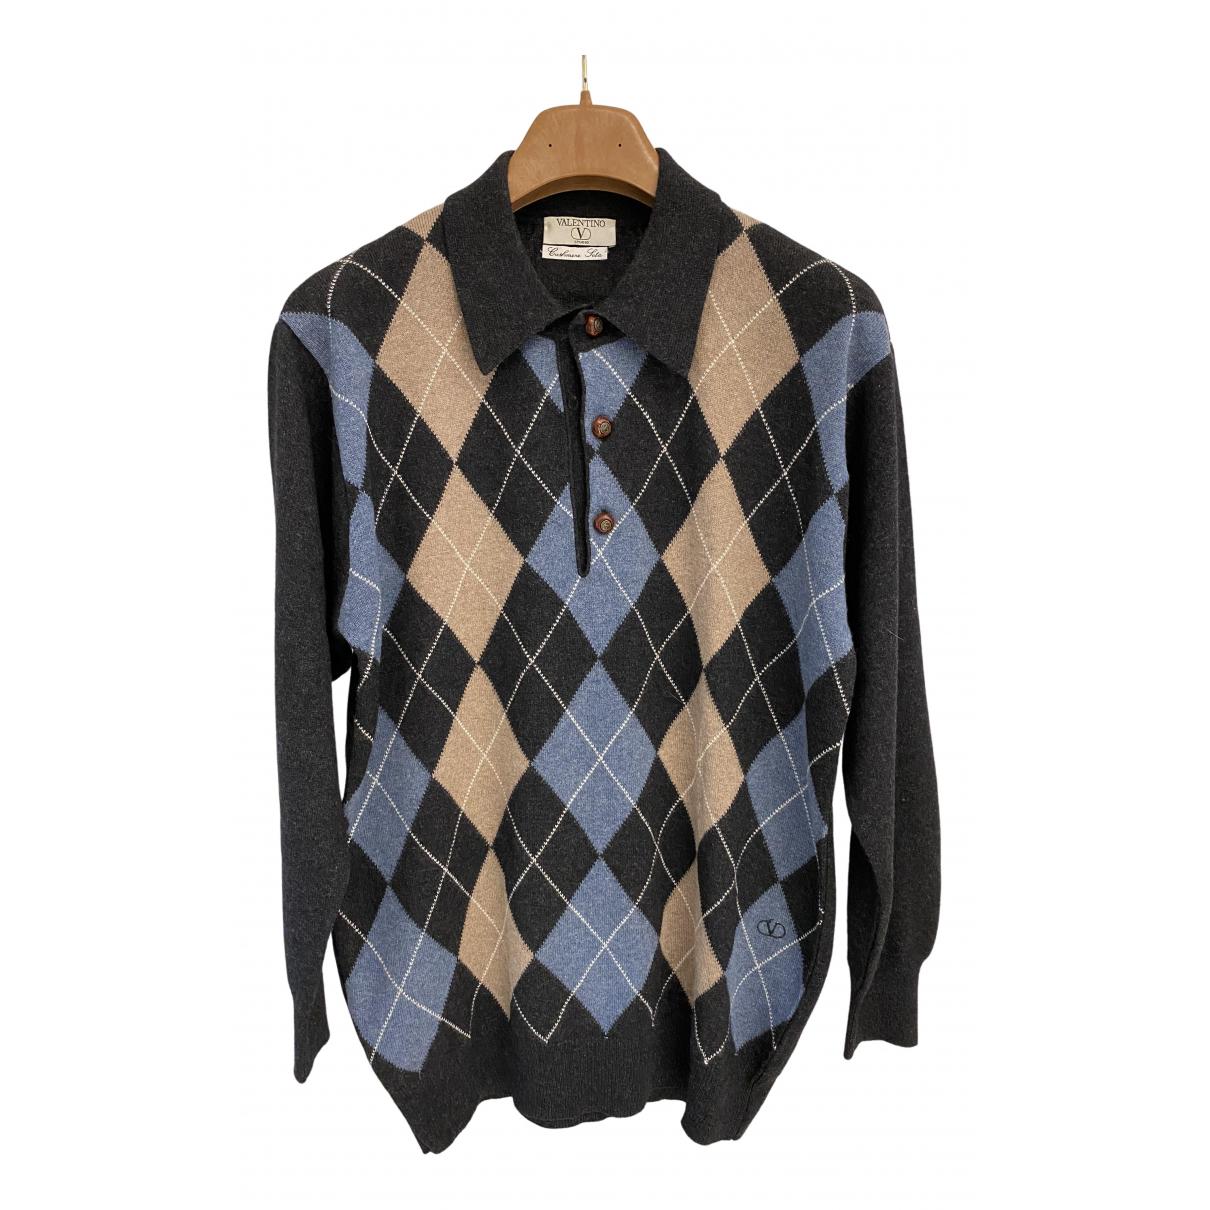 Valentino Garavani N Grey Cashmere Knitwear & Sweatshirts for Men 50 IT